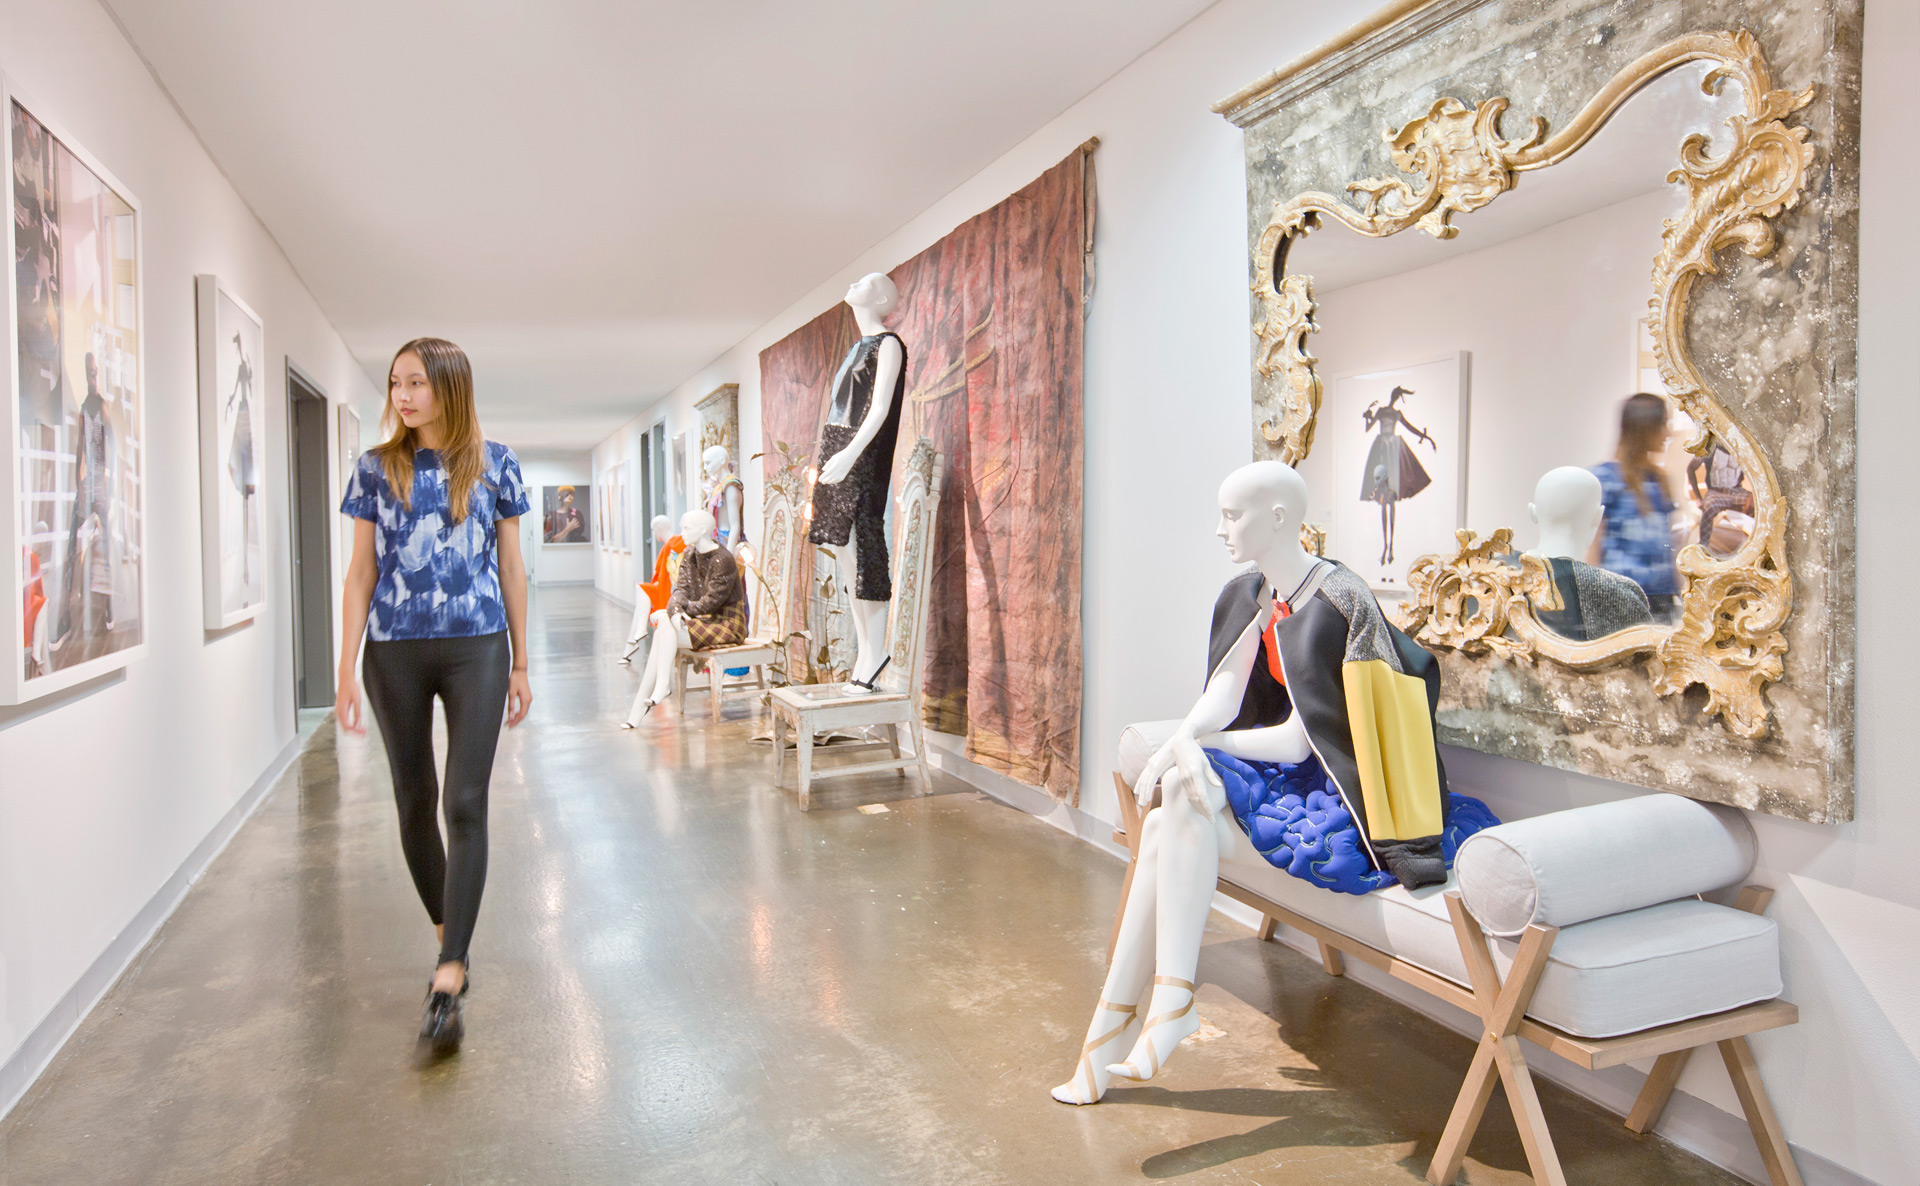 Fashion Design / Sewing Classes in Atlanta GA - Learn4Good